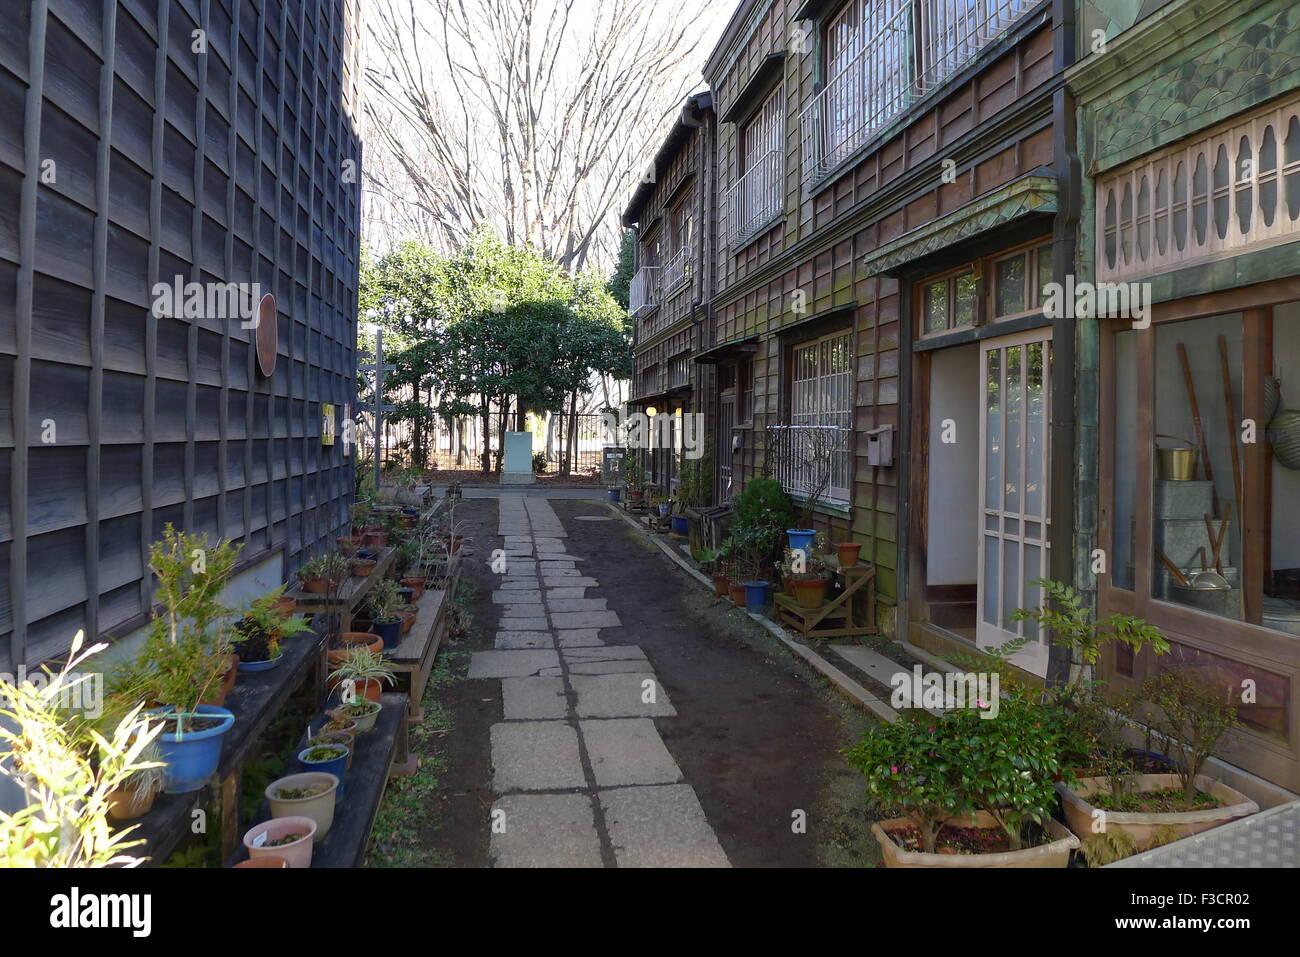 Retro Alley in Tokyo - Stock Image